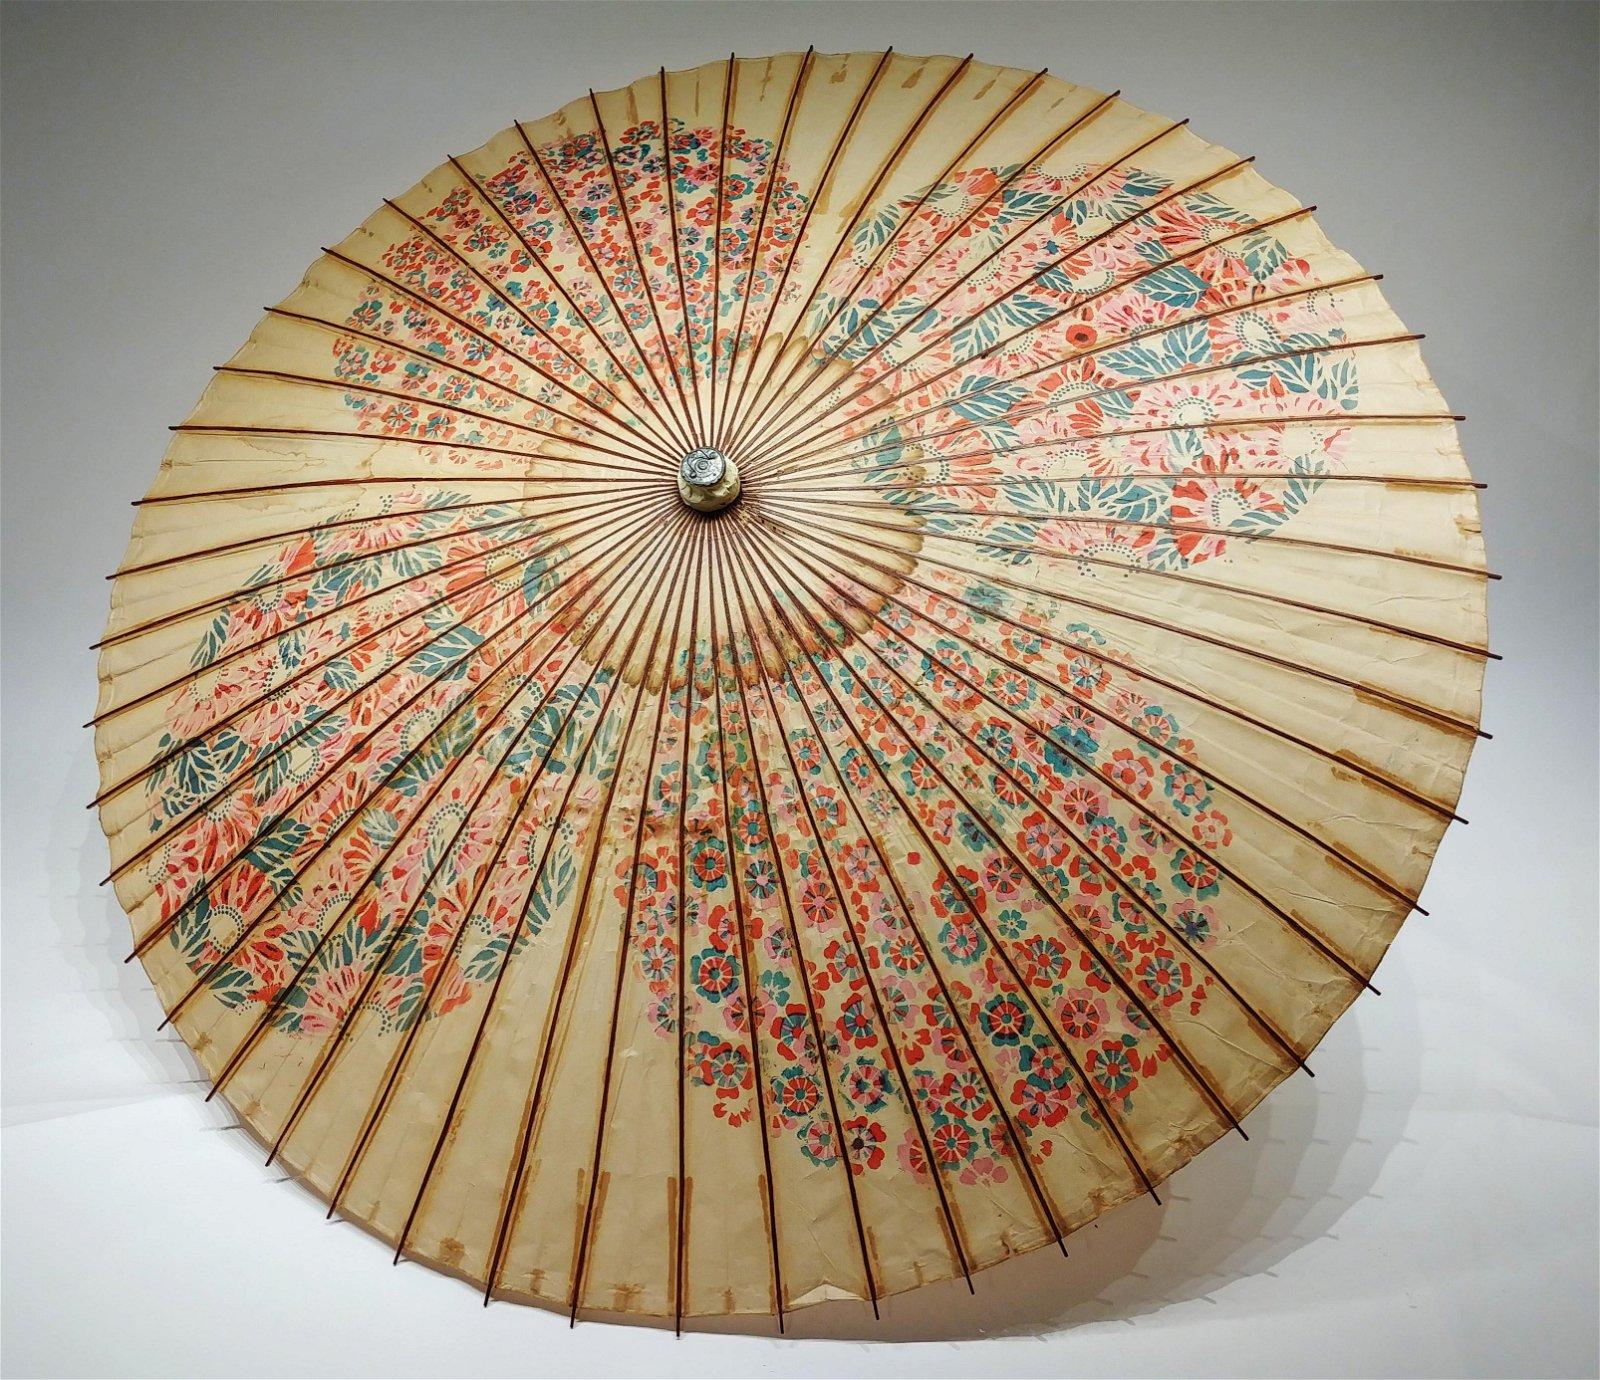 A Japanese Large Paper Umbrella